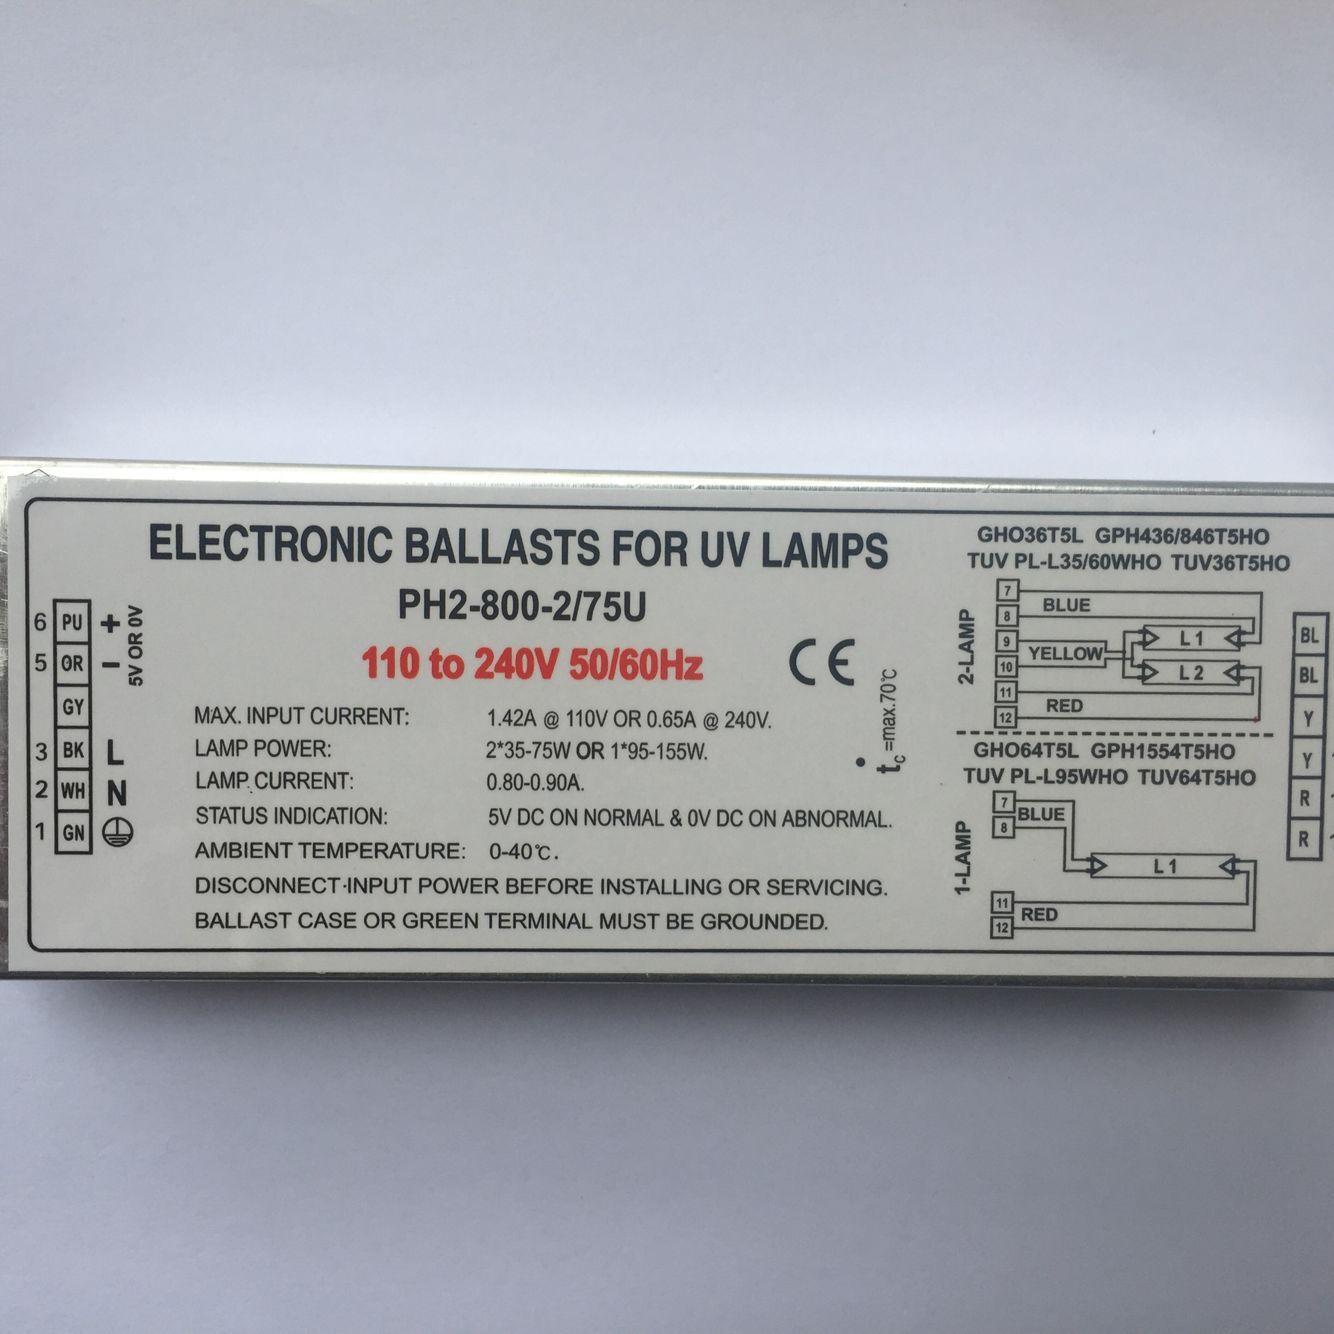 PH12-230-800-2/75 balastos electrónicos de lámpara germicida para lámpara UV GHO36T5L GPH436/846T5HO TUV PL-L35/60WHO TUV36T5HO